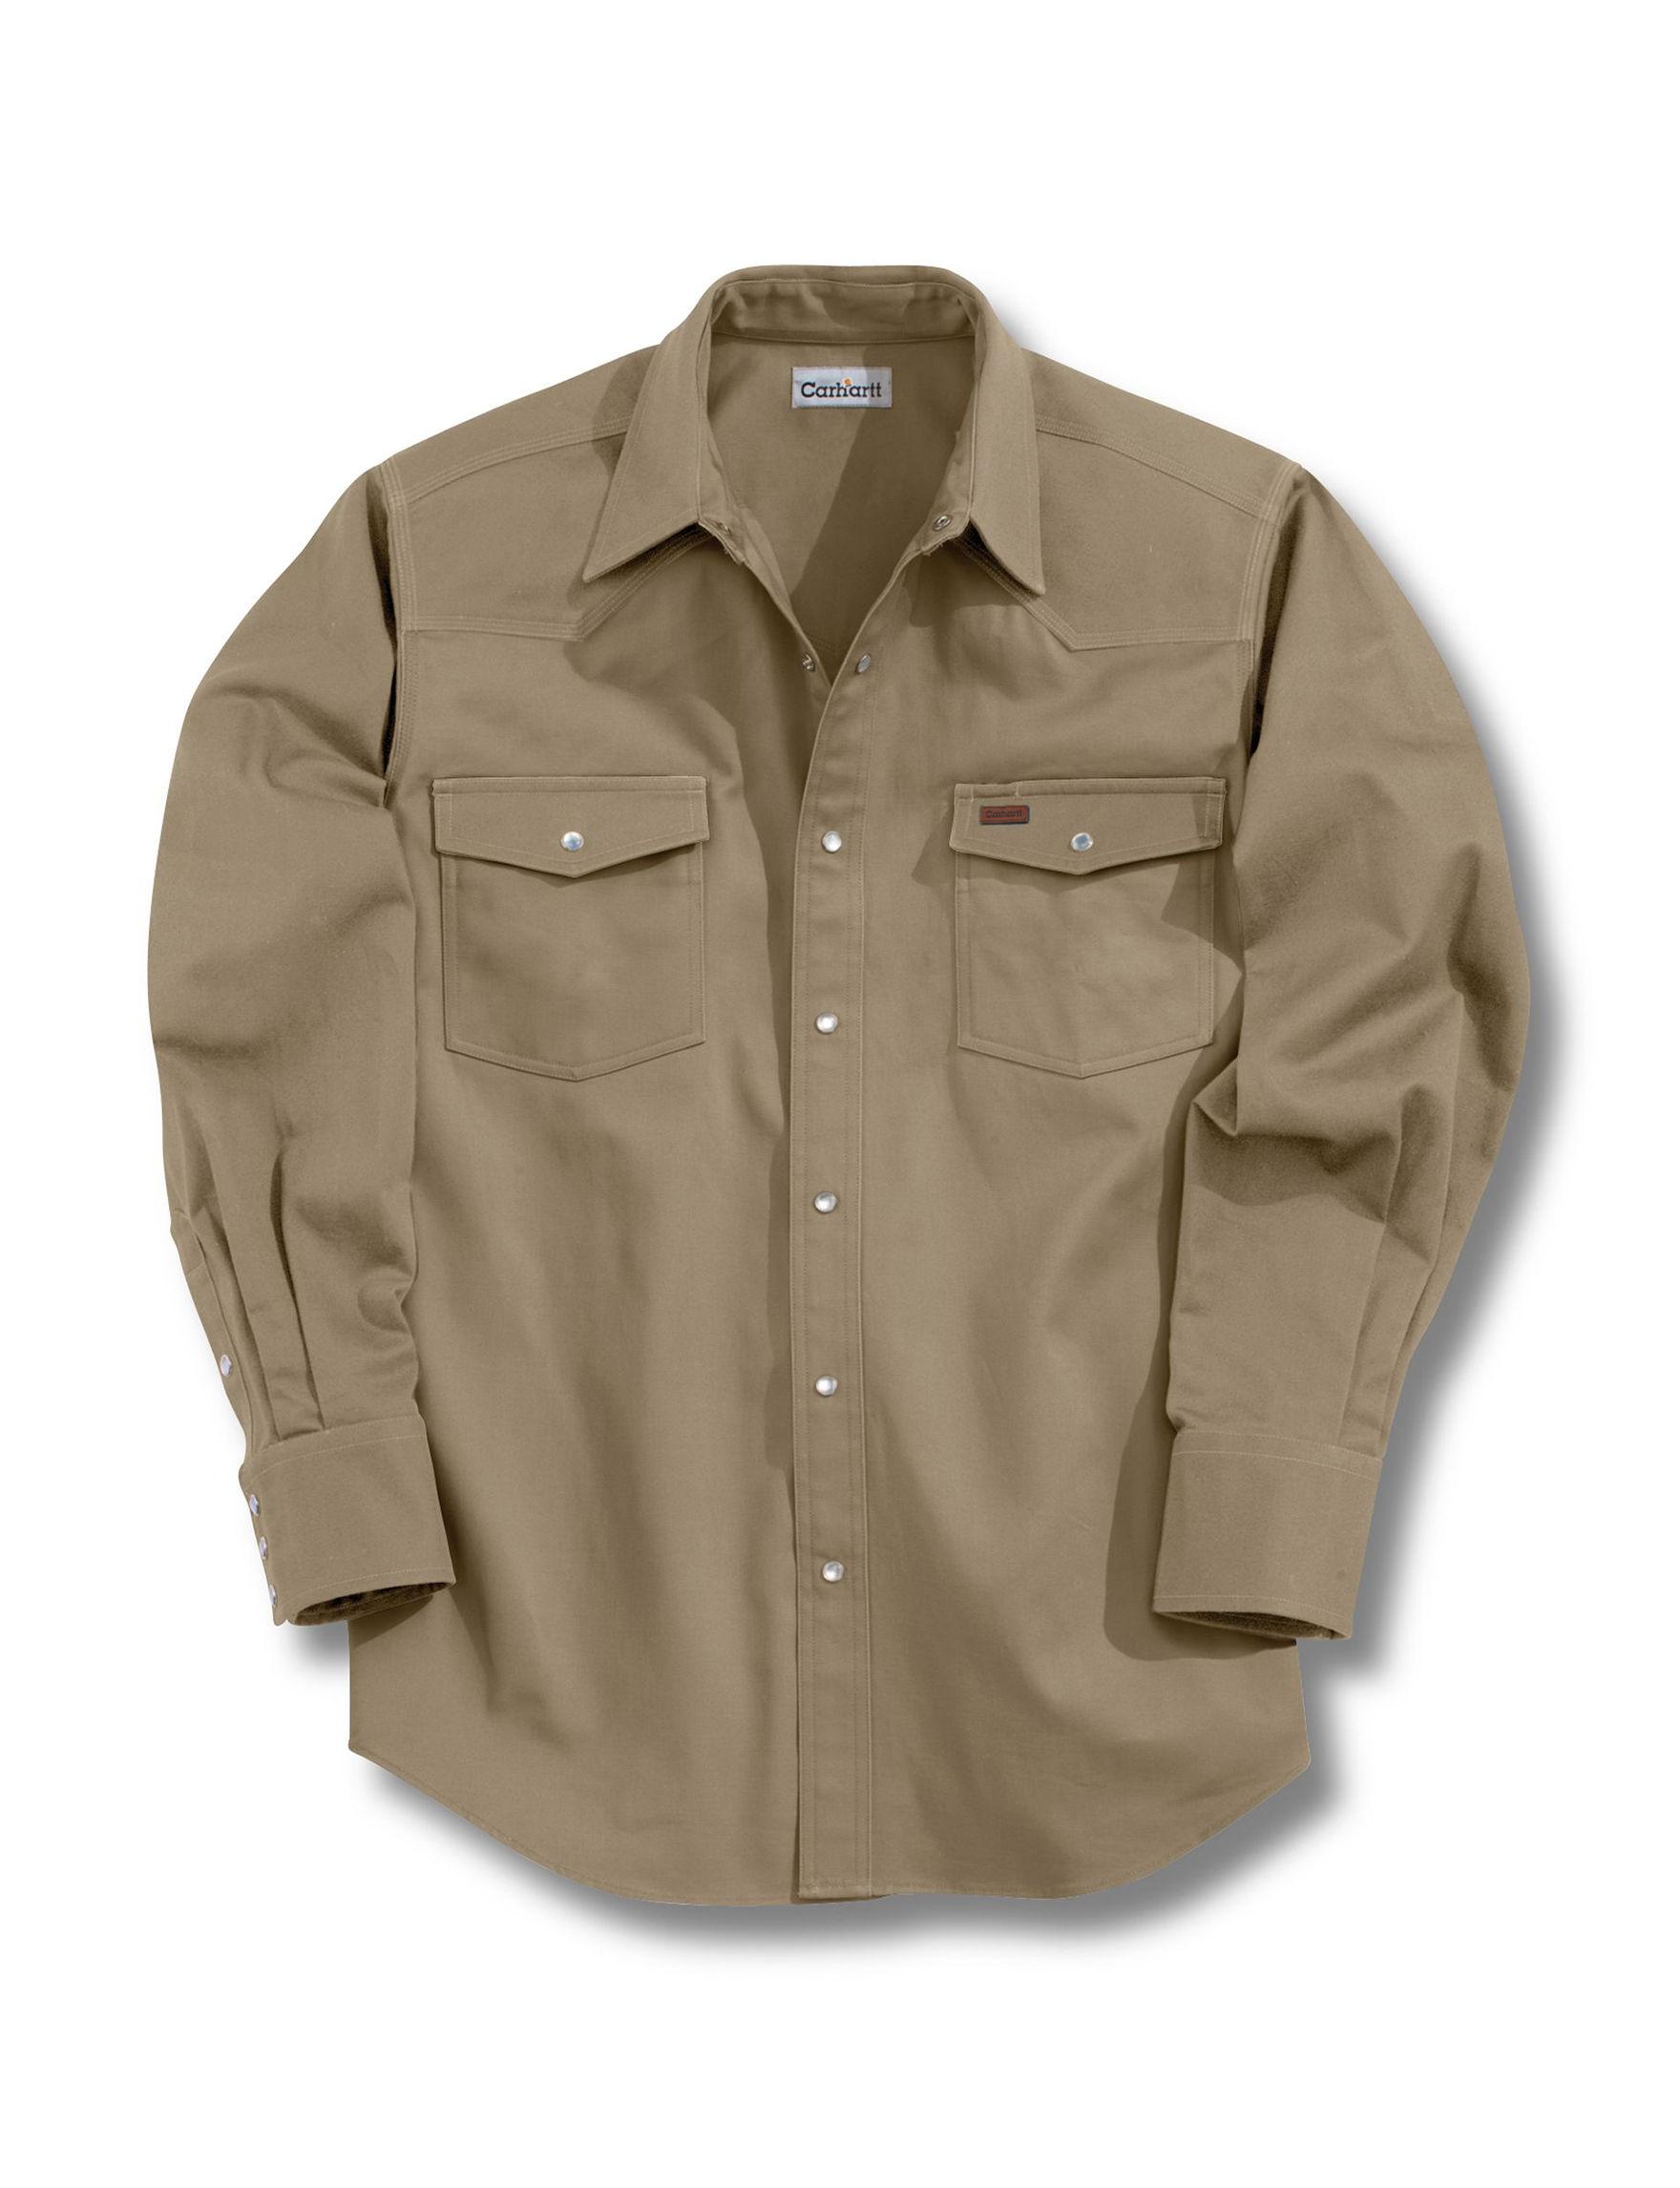 Carhartt Khaki Casual Button Down Shirts